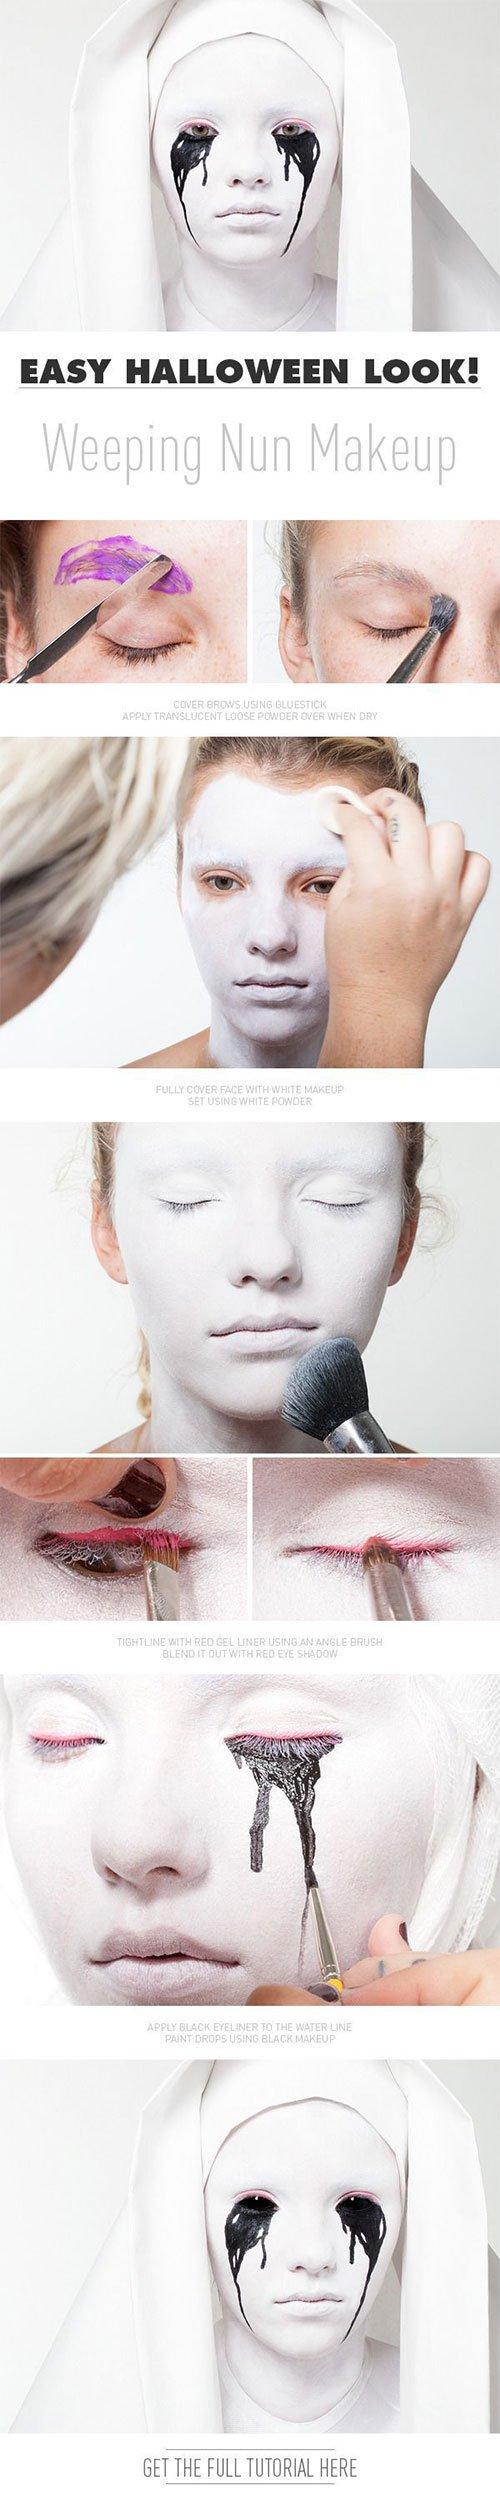 Easy Halloween Weeping Nun Makeup Tutorial